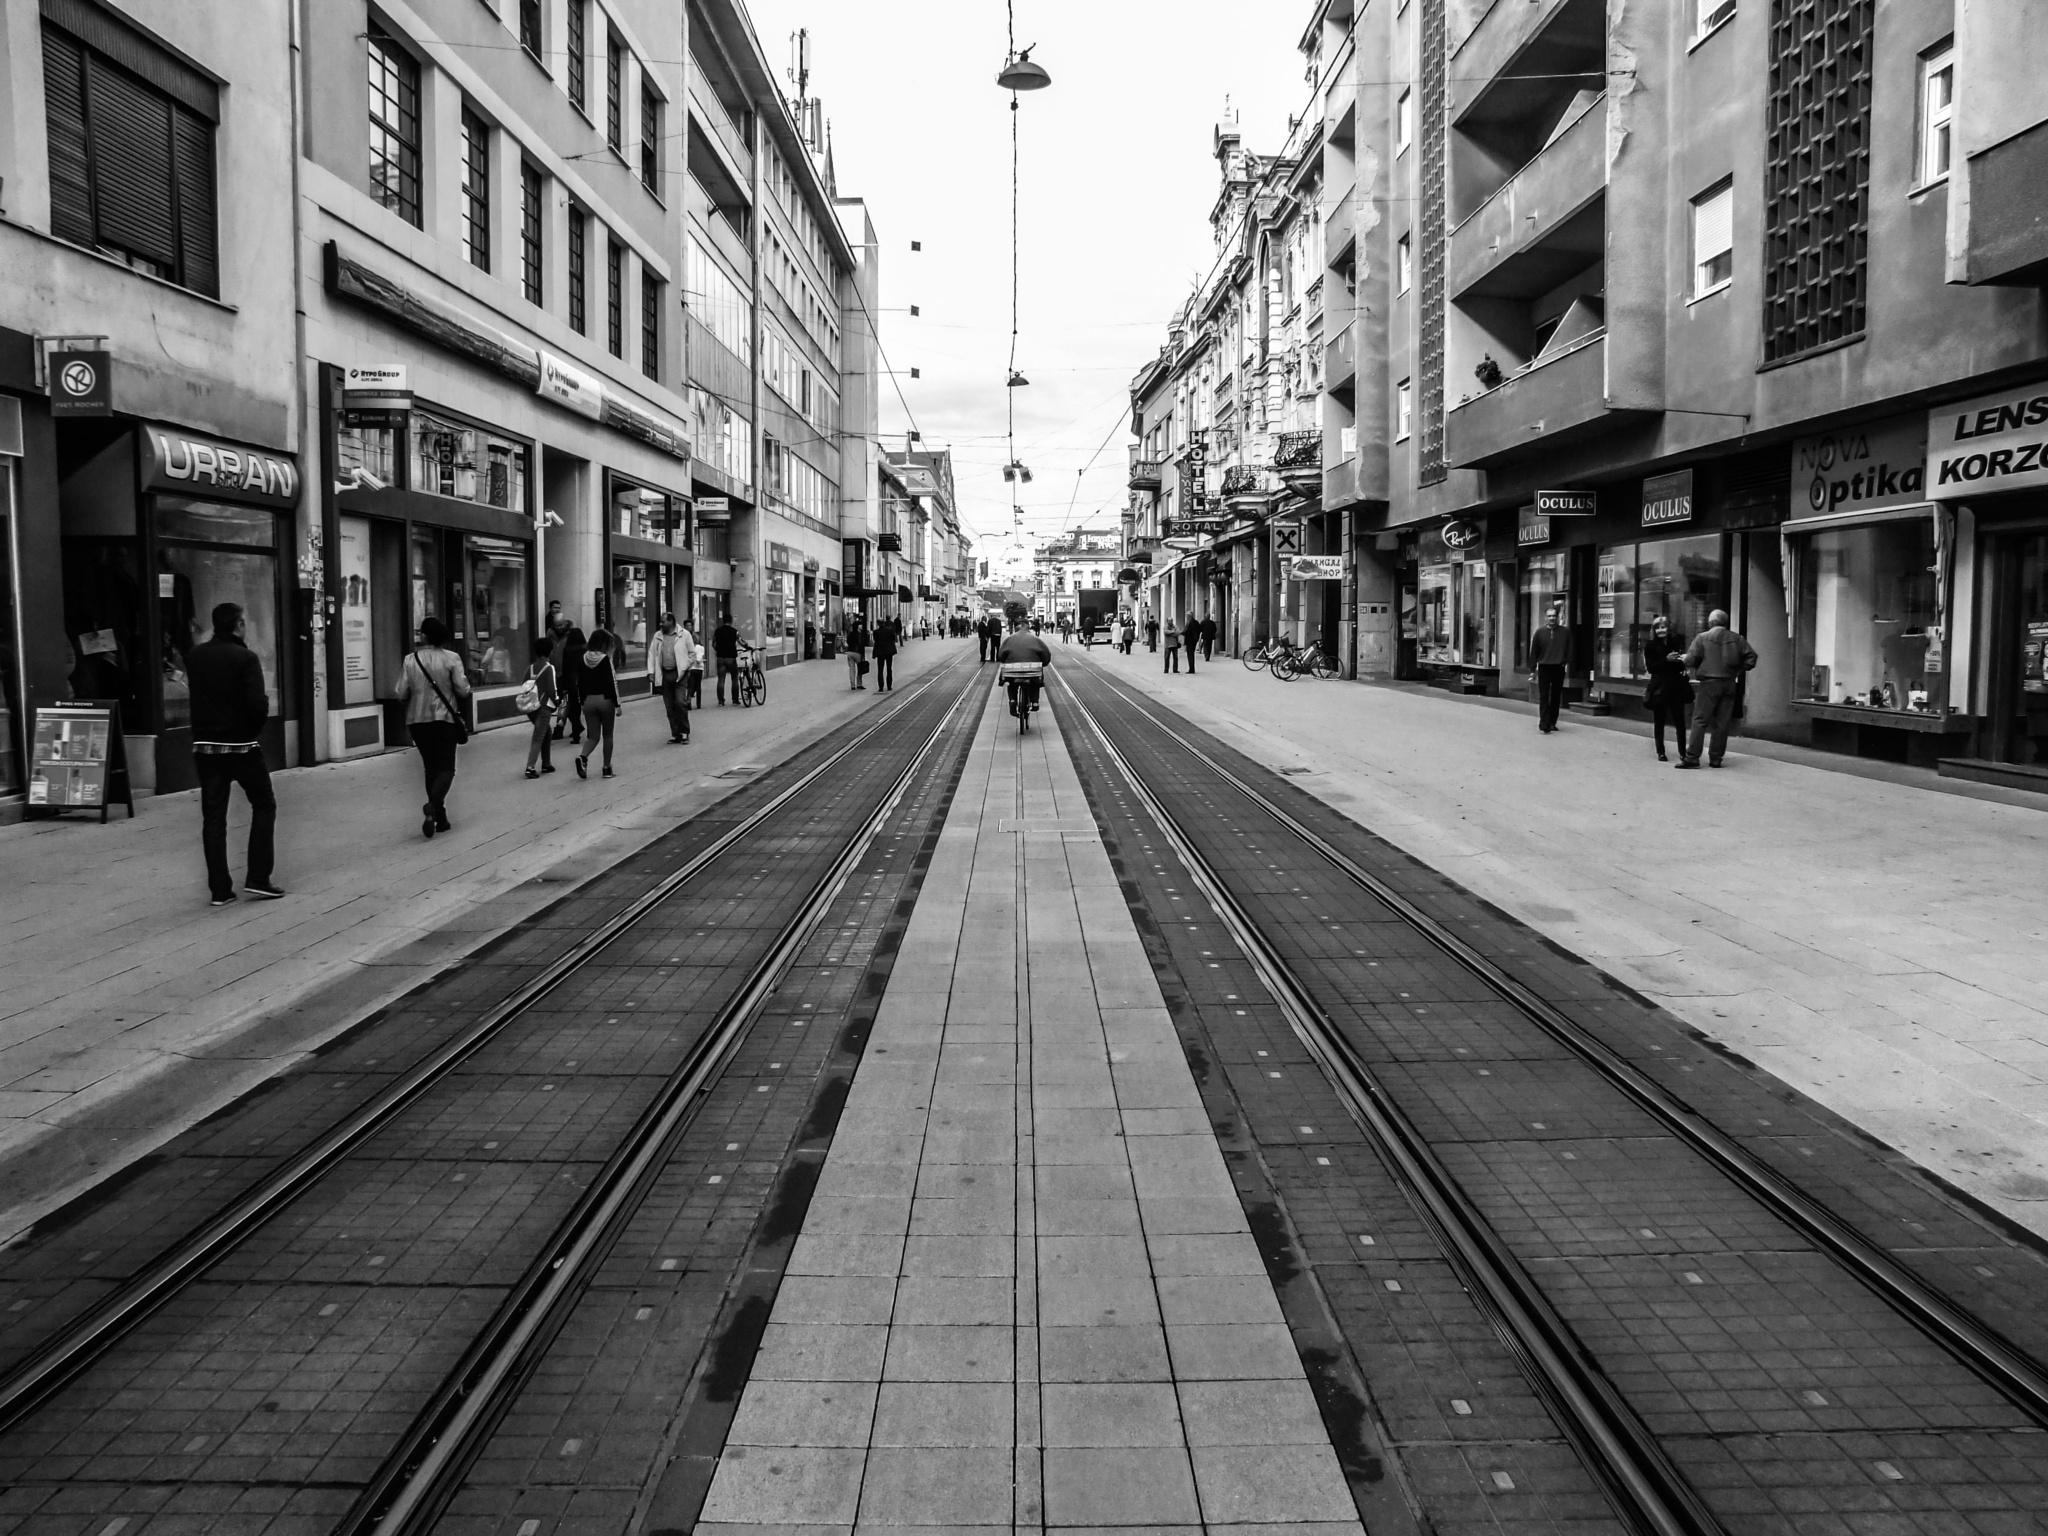 Osijek by RatimirK